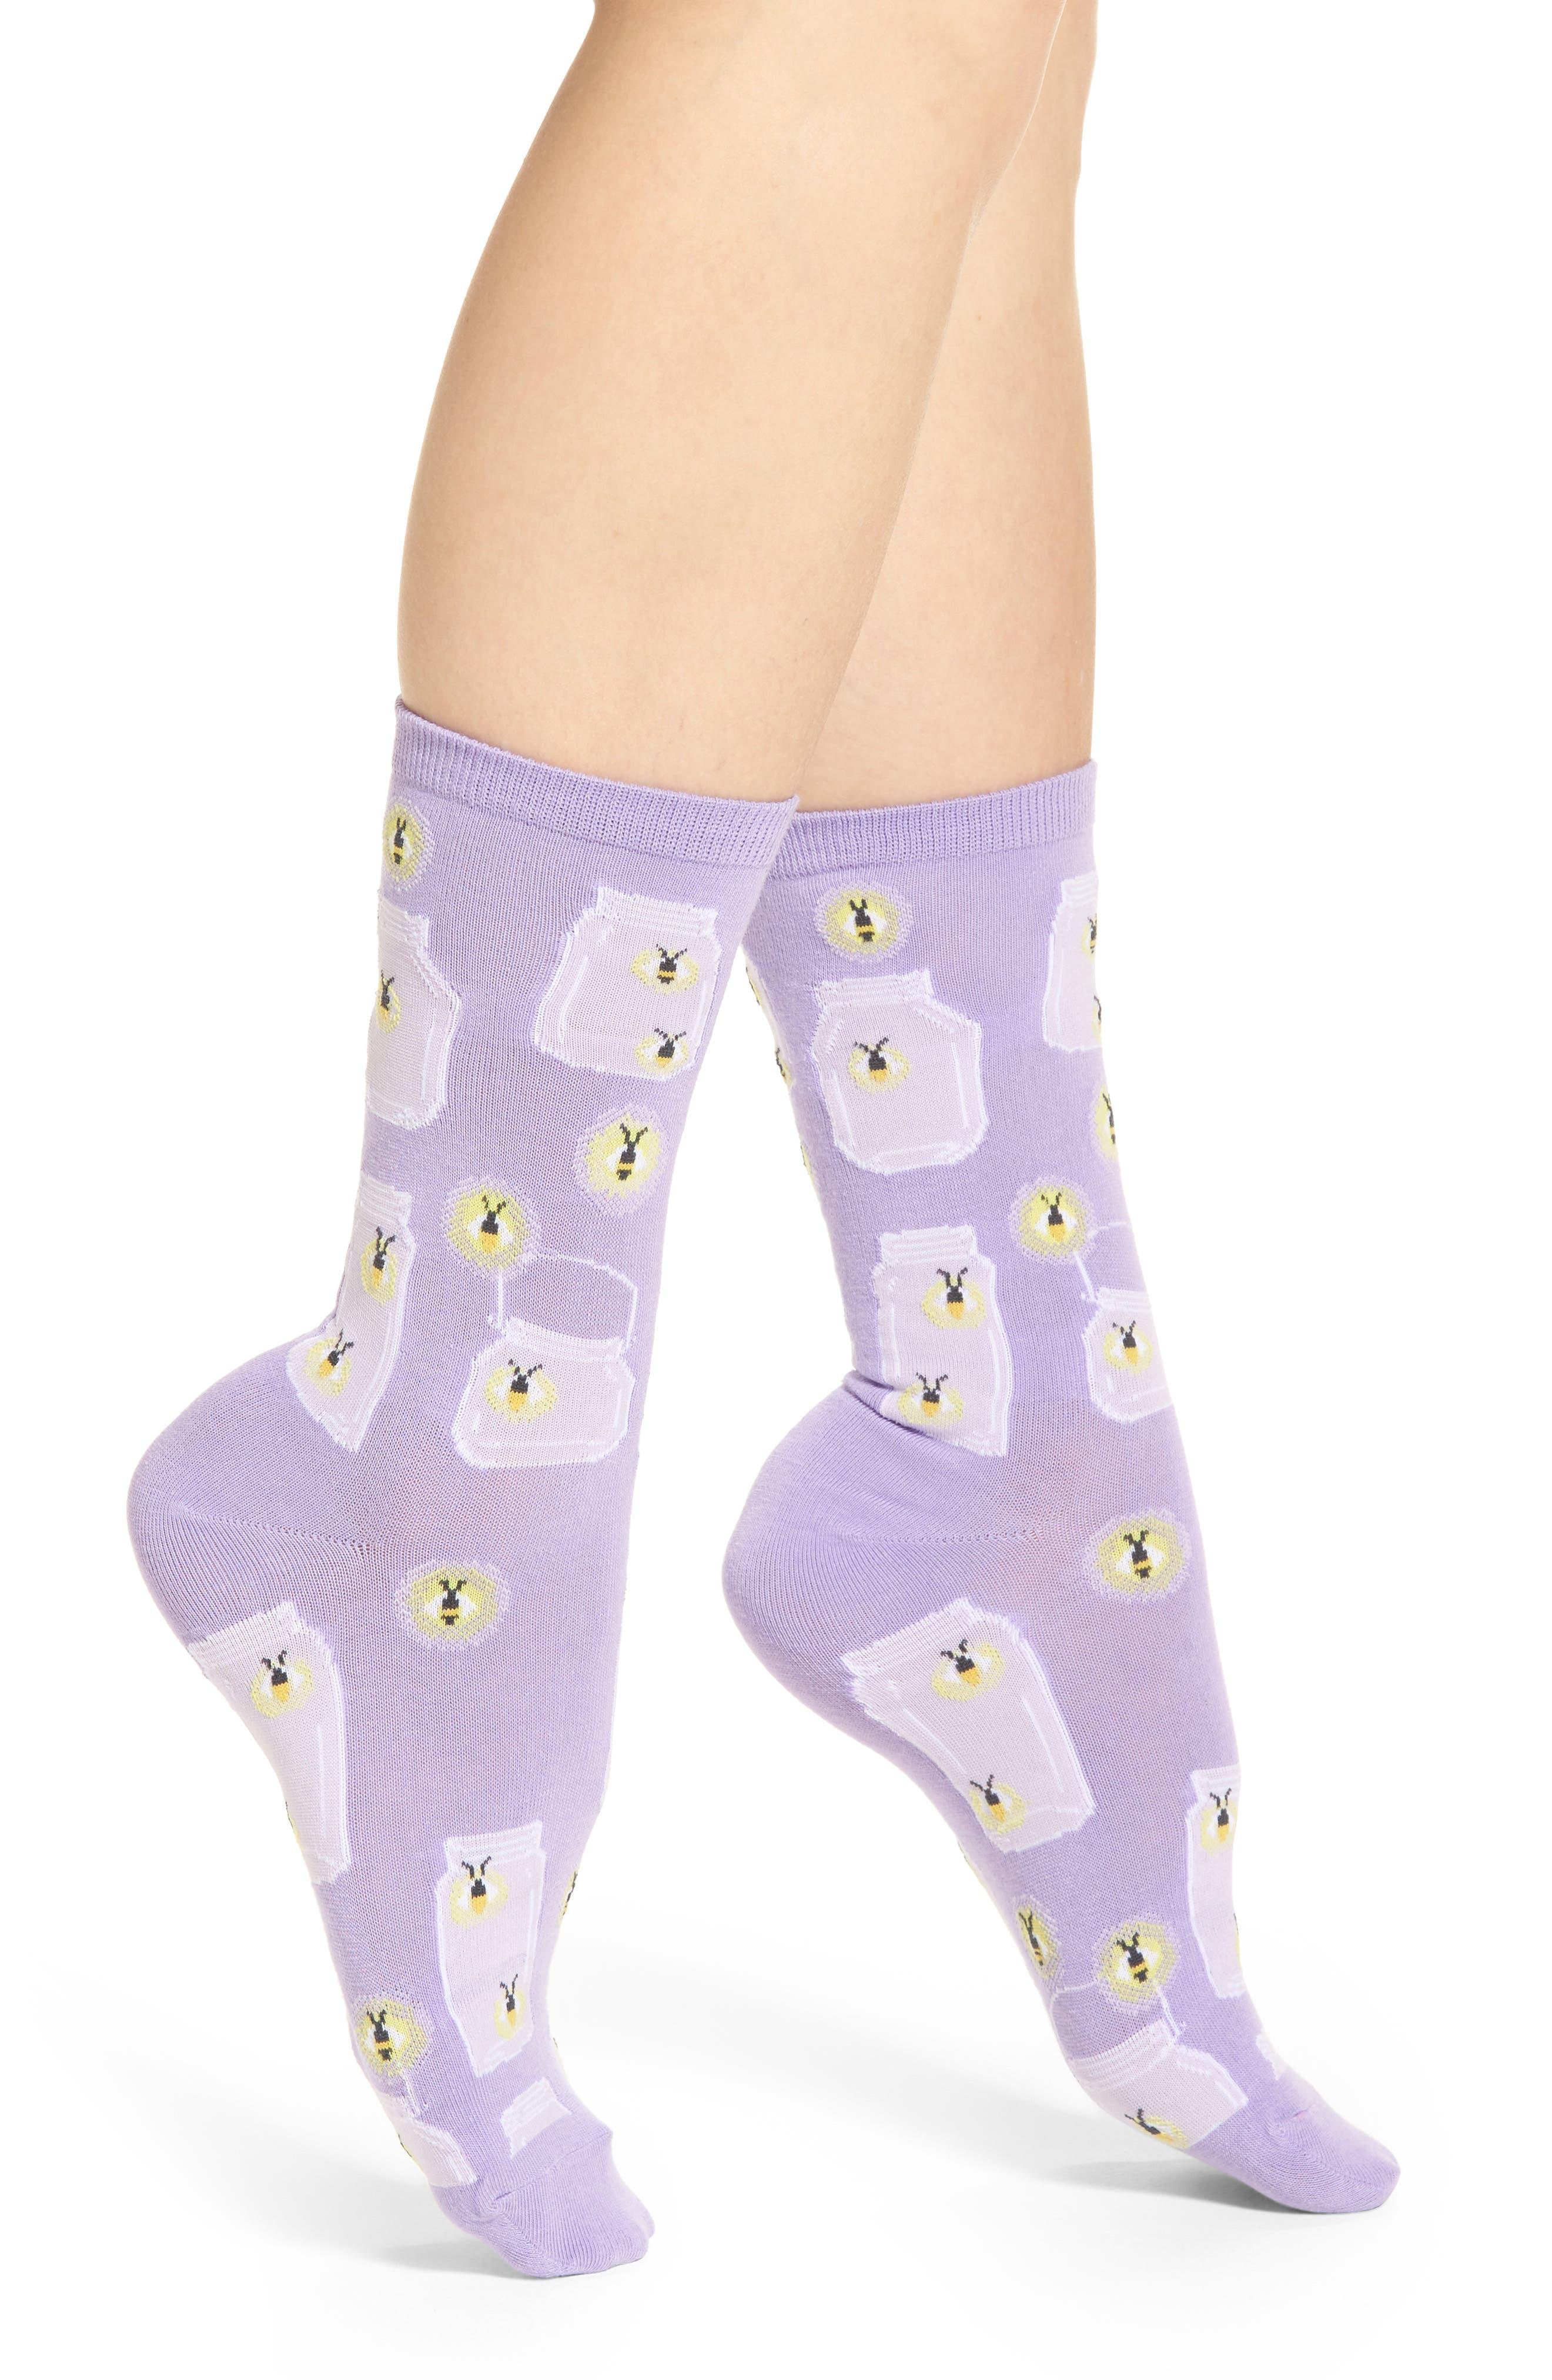 Fireflies Crew Socks,                             Main thumbnail 1, color,                             Lavender